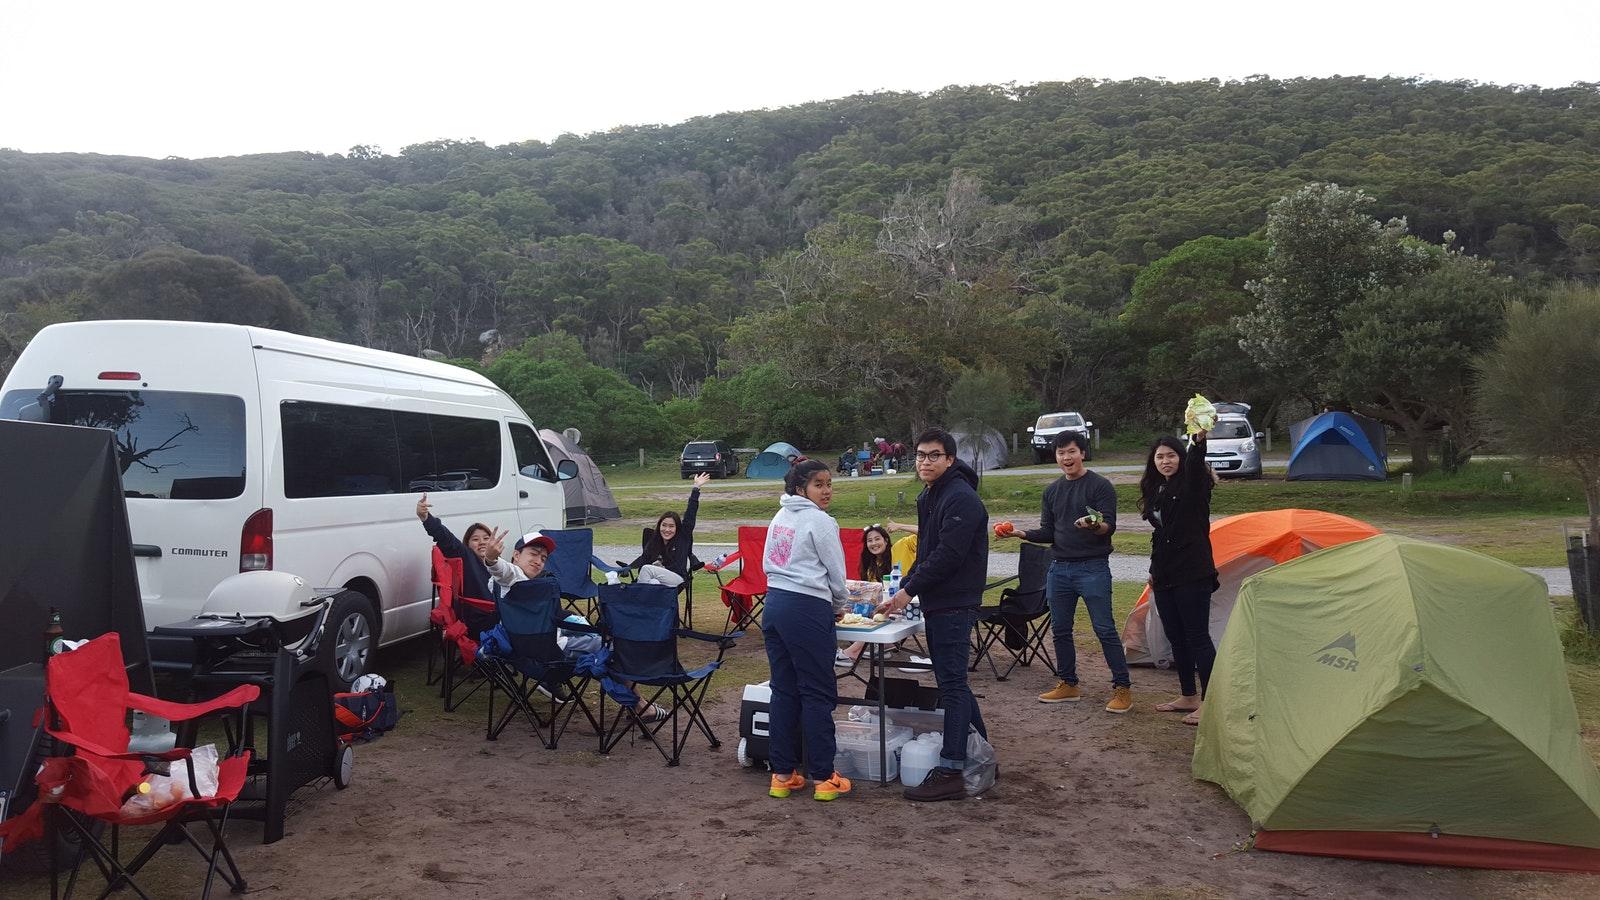 Camping at Tidal River